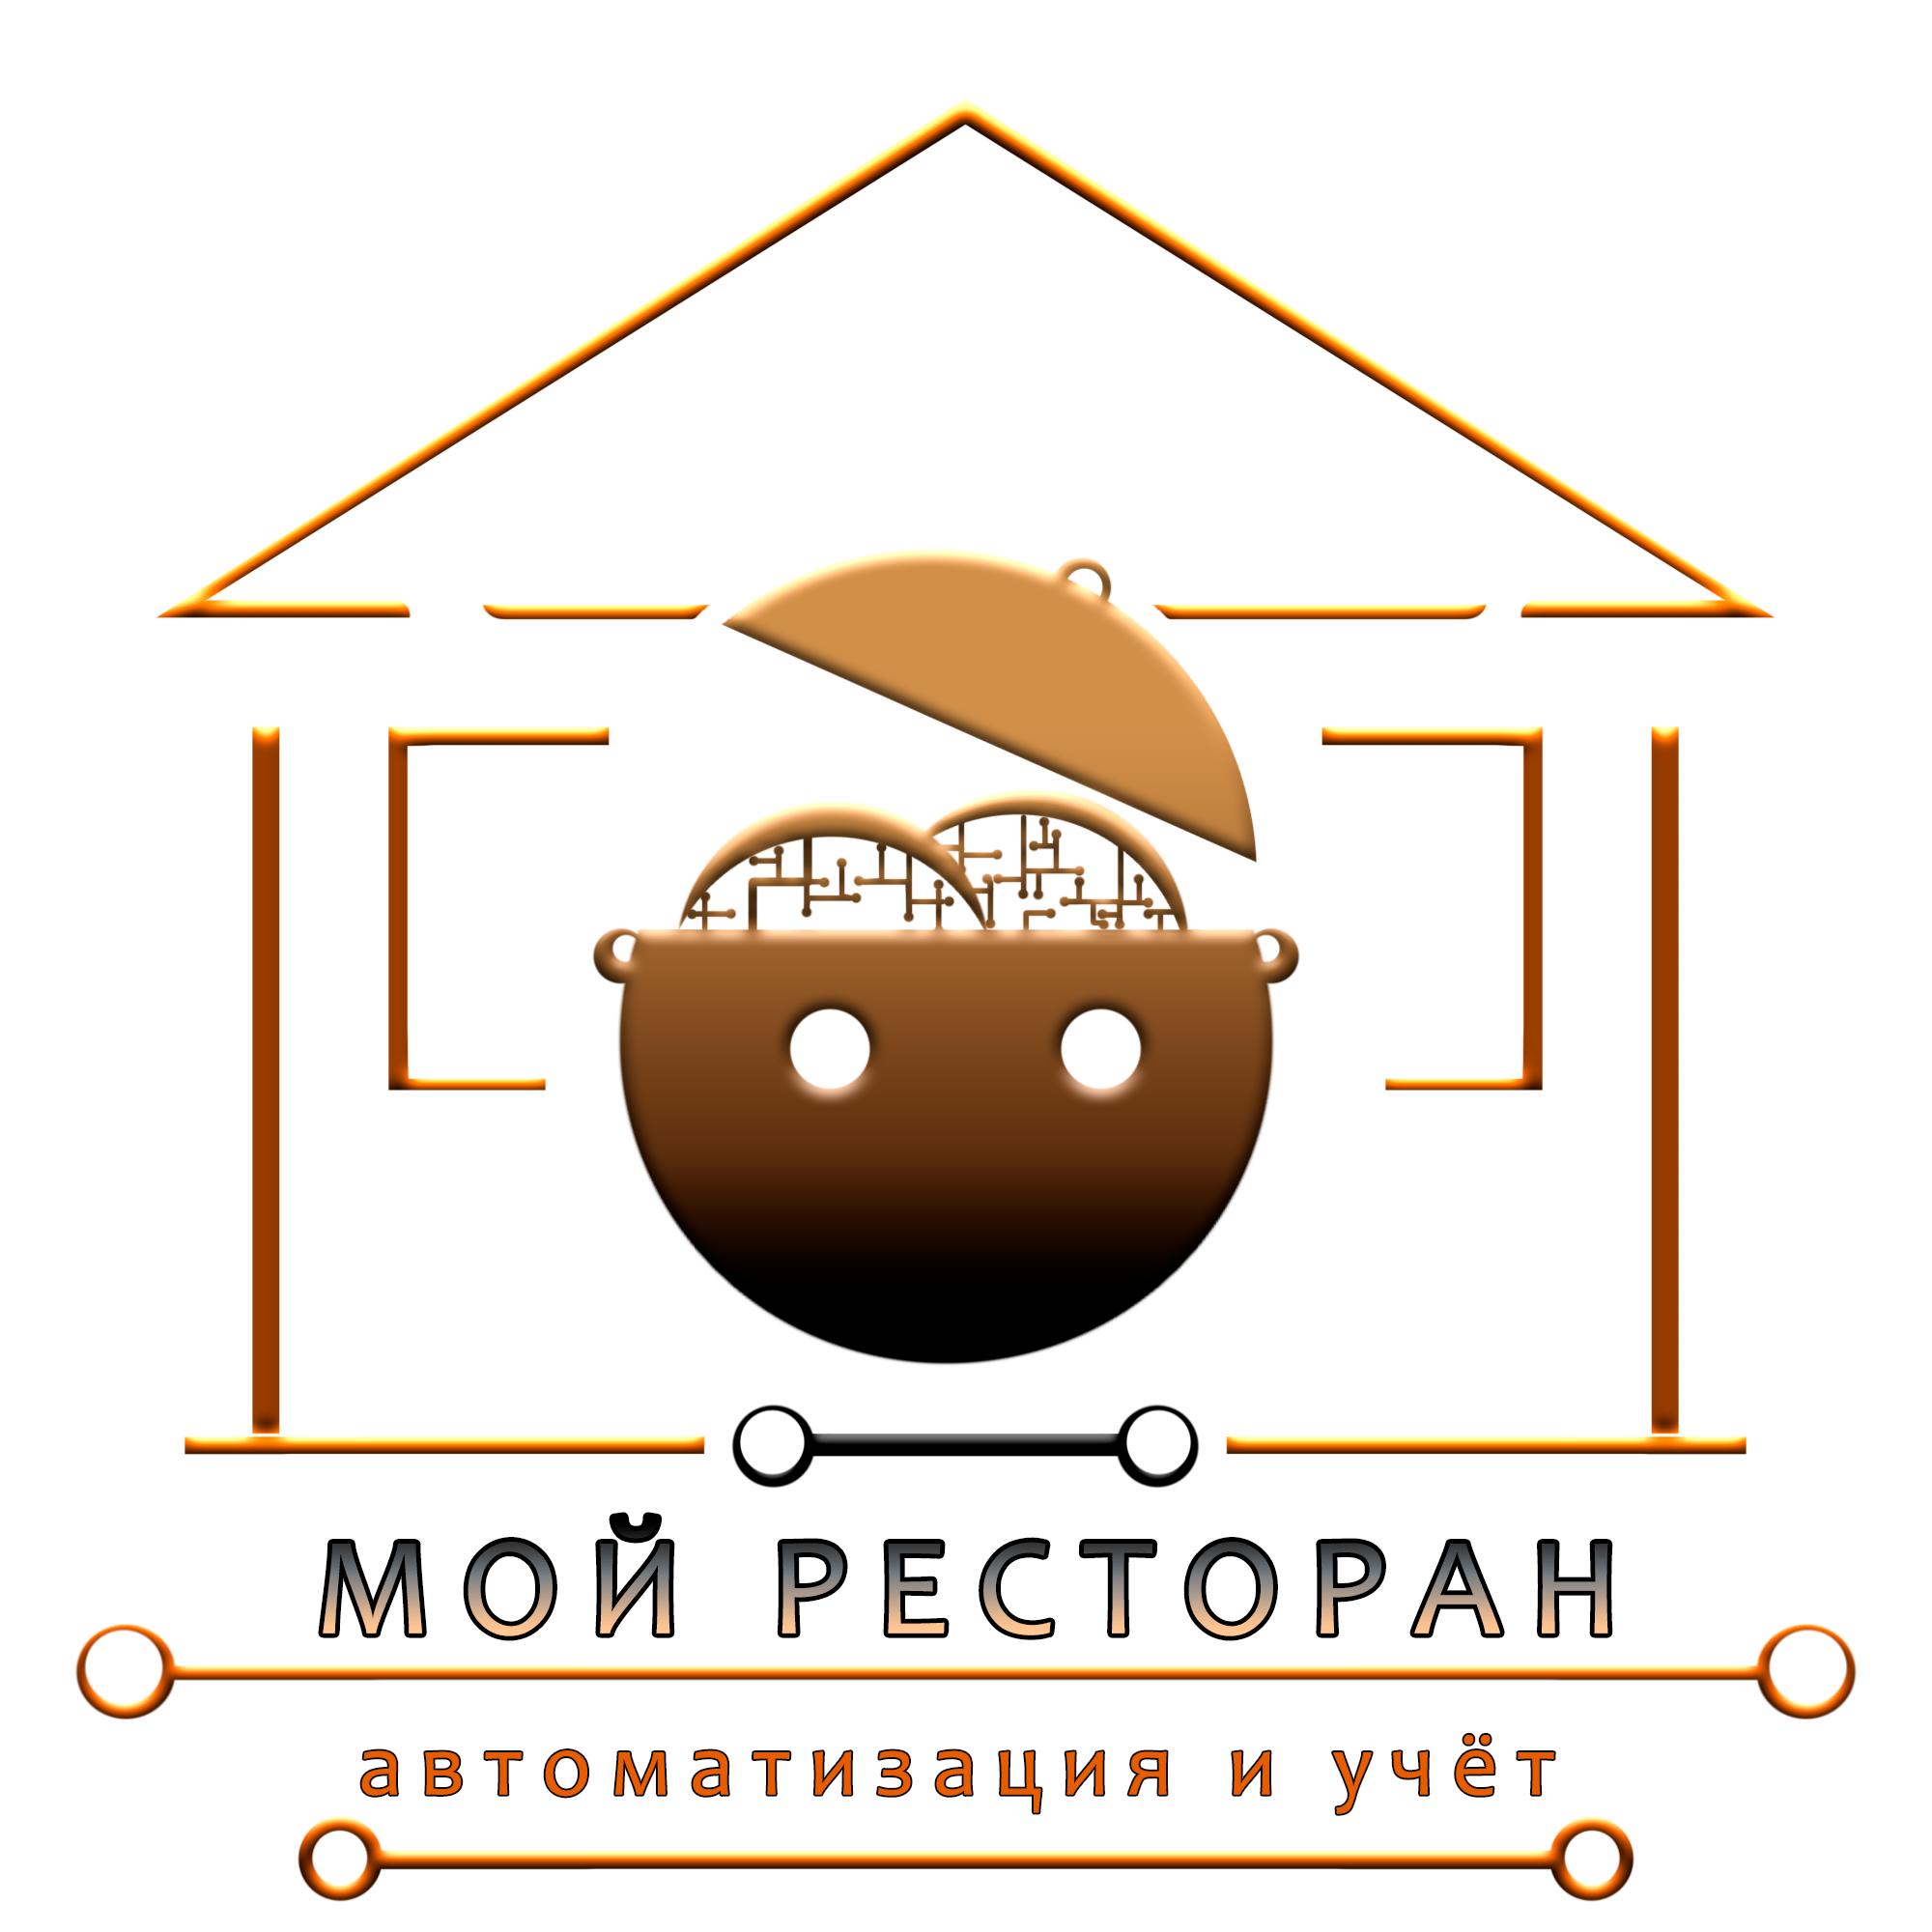 Разработать логотип и фавикон для IT- компании фото f_0275d542ab130d24.png